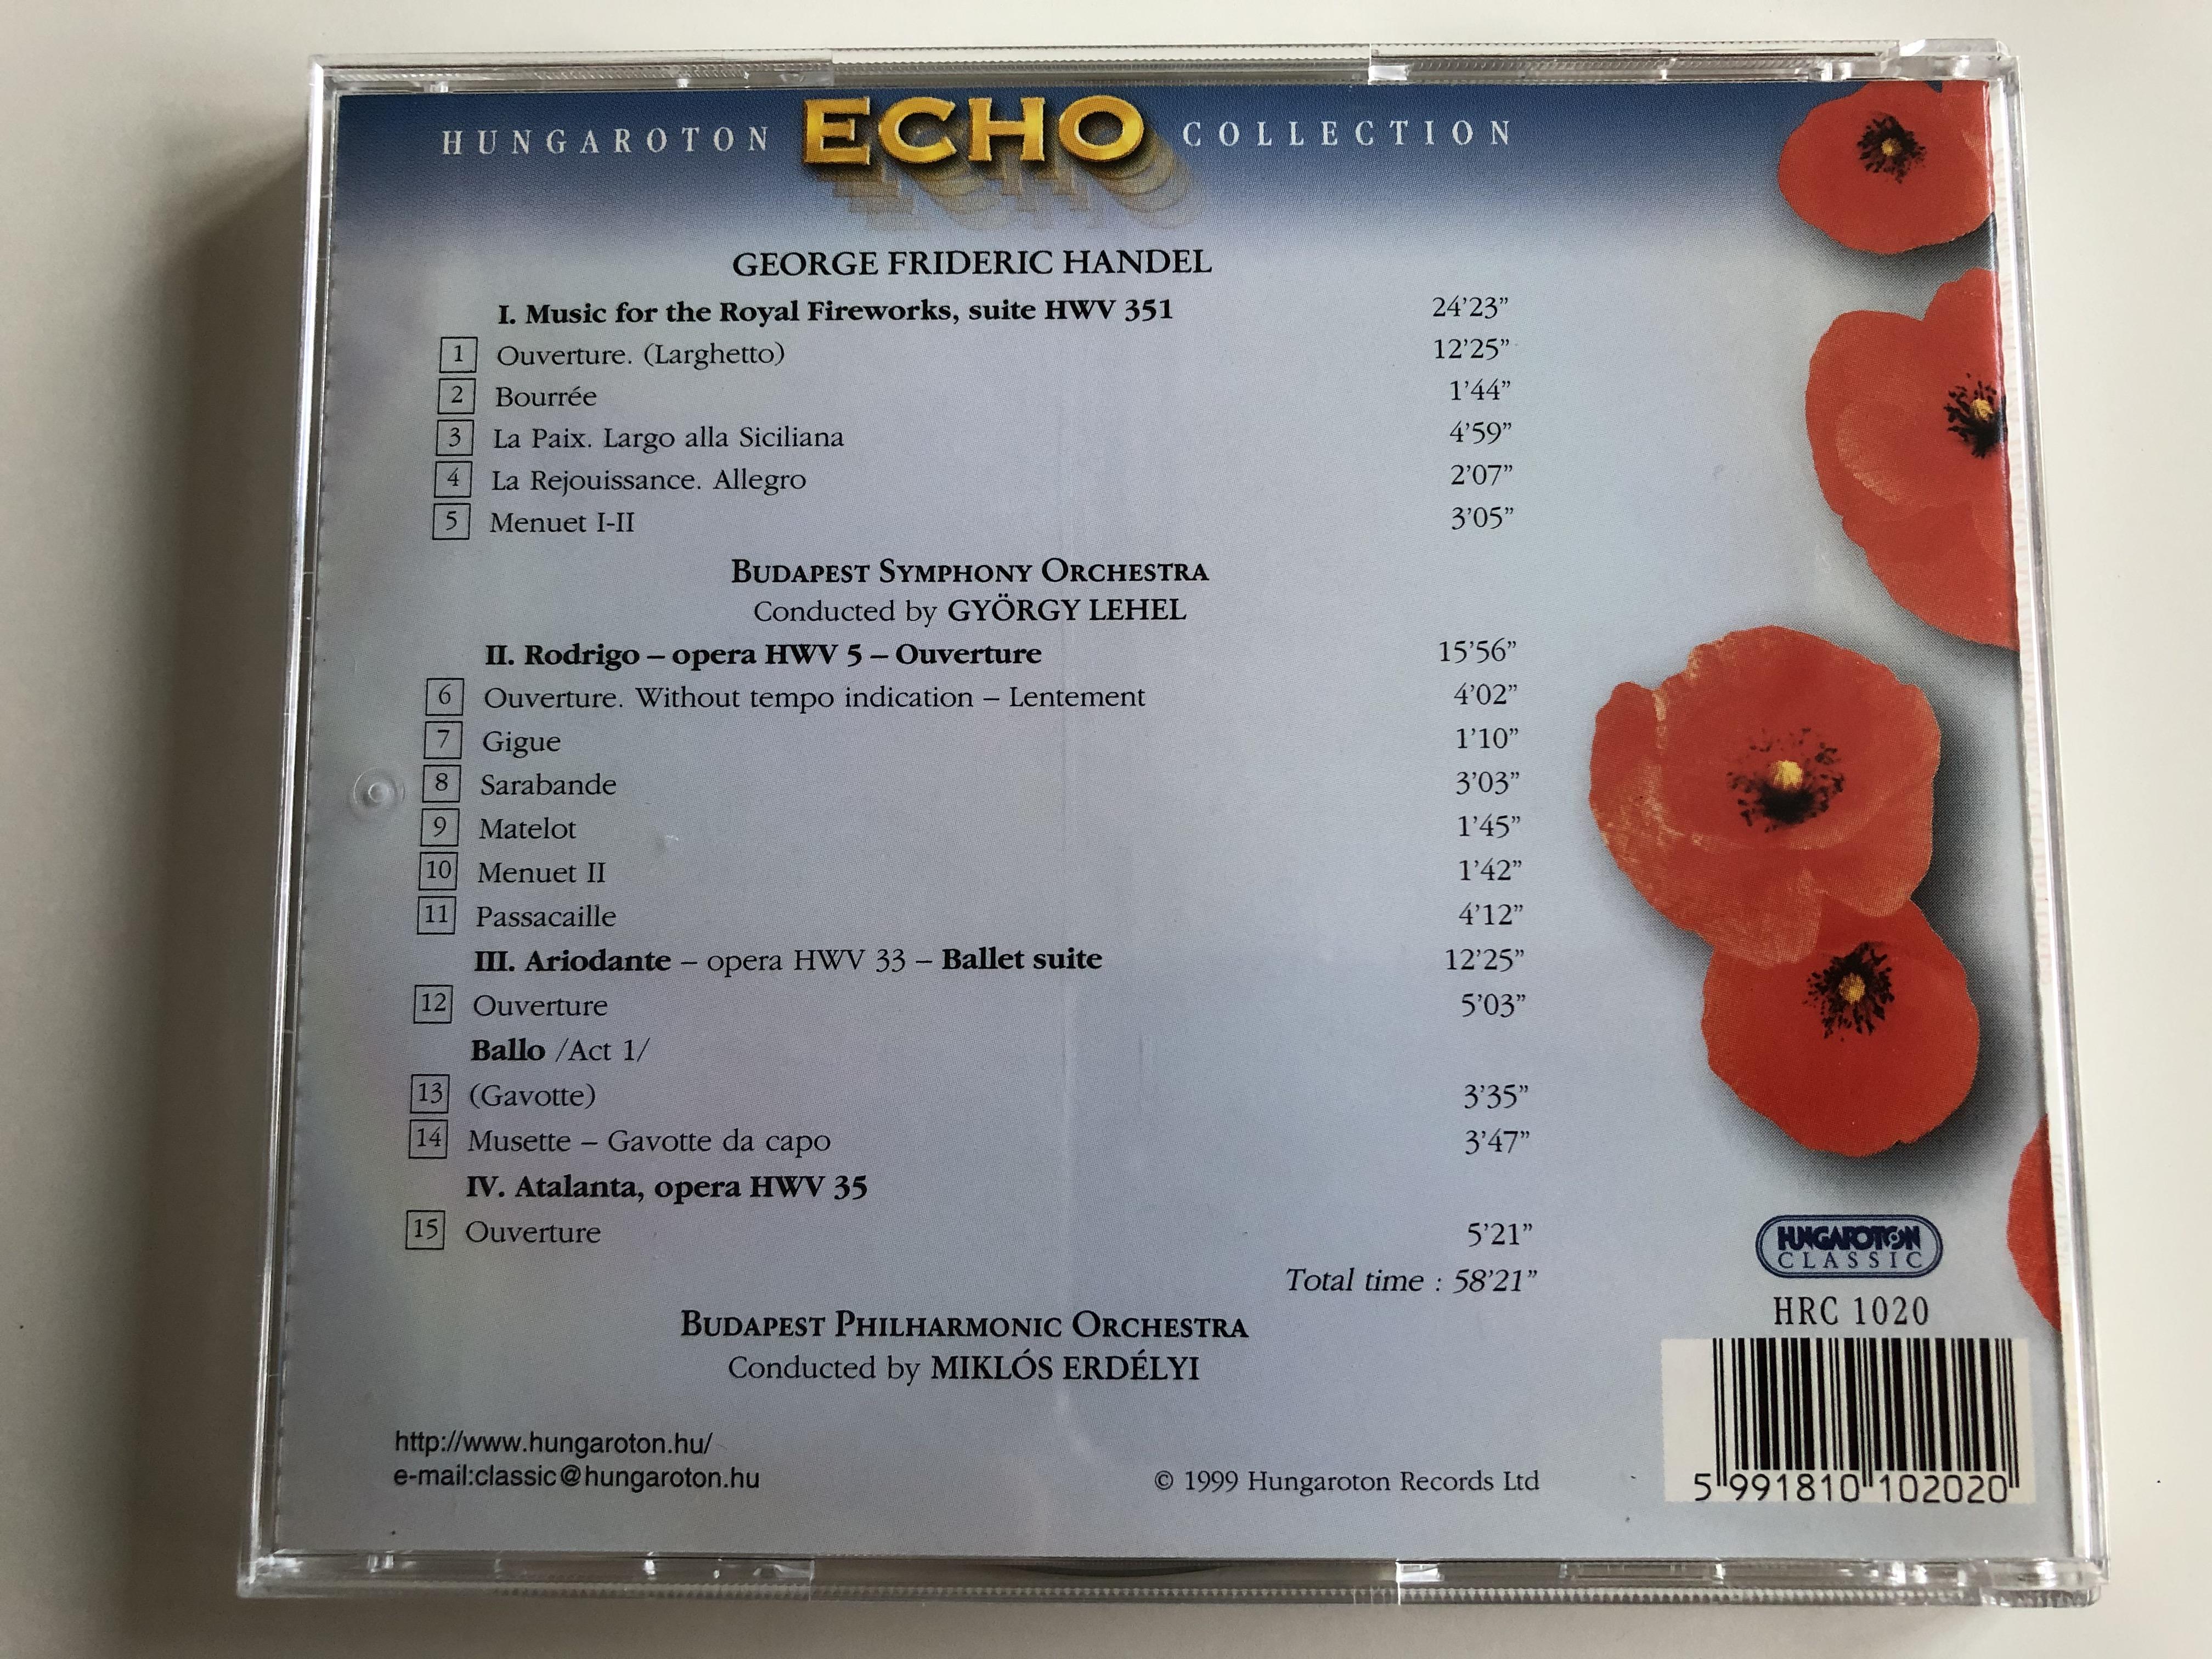 h-ndel-music-for-the-royal-fireworks-ouvertures-rodrigo-ariodante-atalanta-budapest-symphony-orchestra-gy-rgy-lehel-budapest-philharmonic-orchestra-mikl-s-erd-lyi-hungaroton-classic-5-.jpg